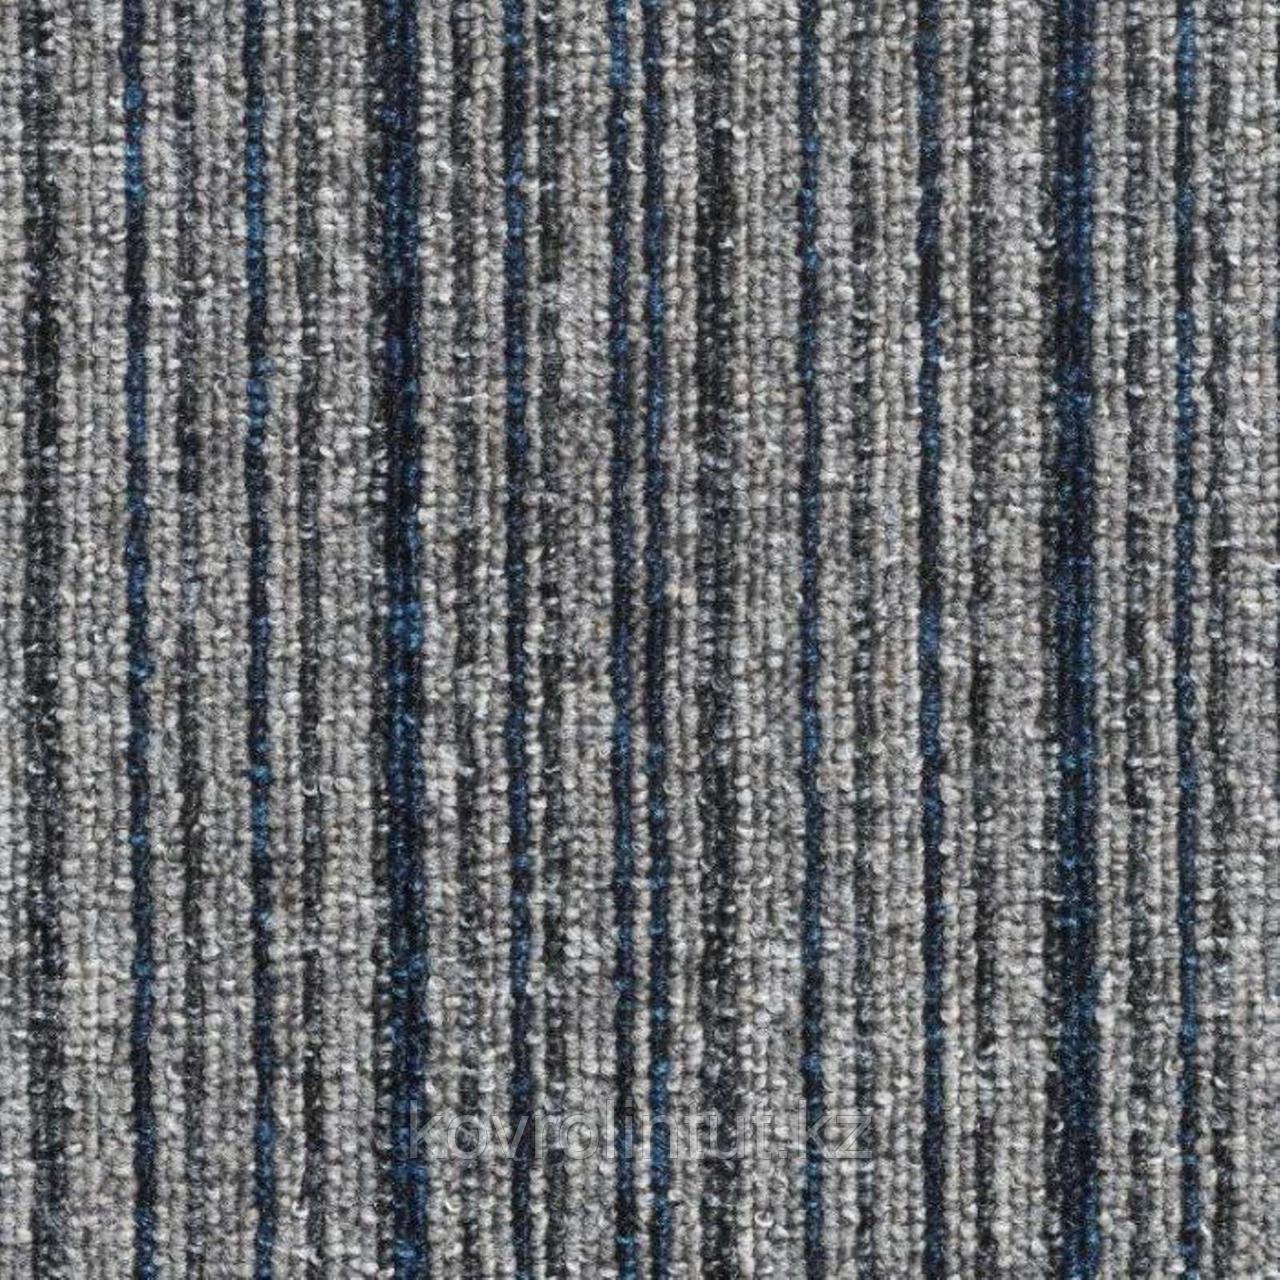 Плитка ковровая Сondor, Solid stripe 575, 50х50, 5м2/уп